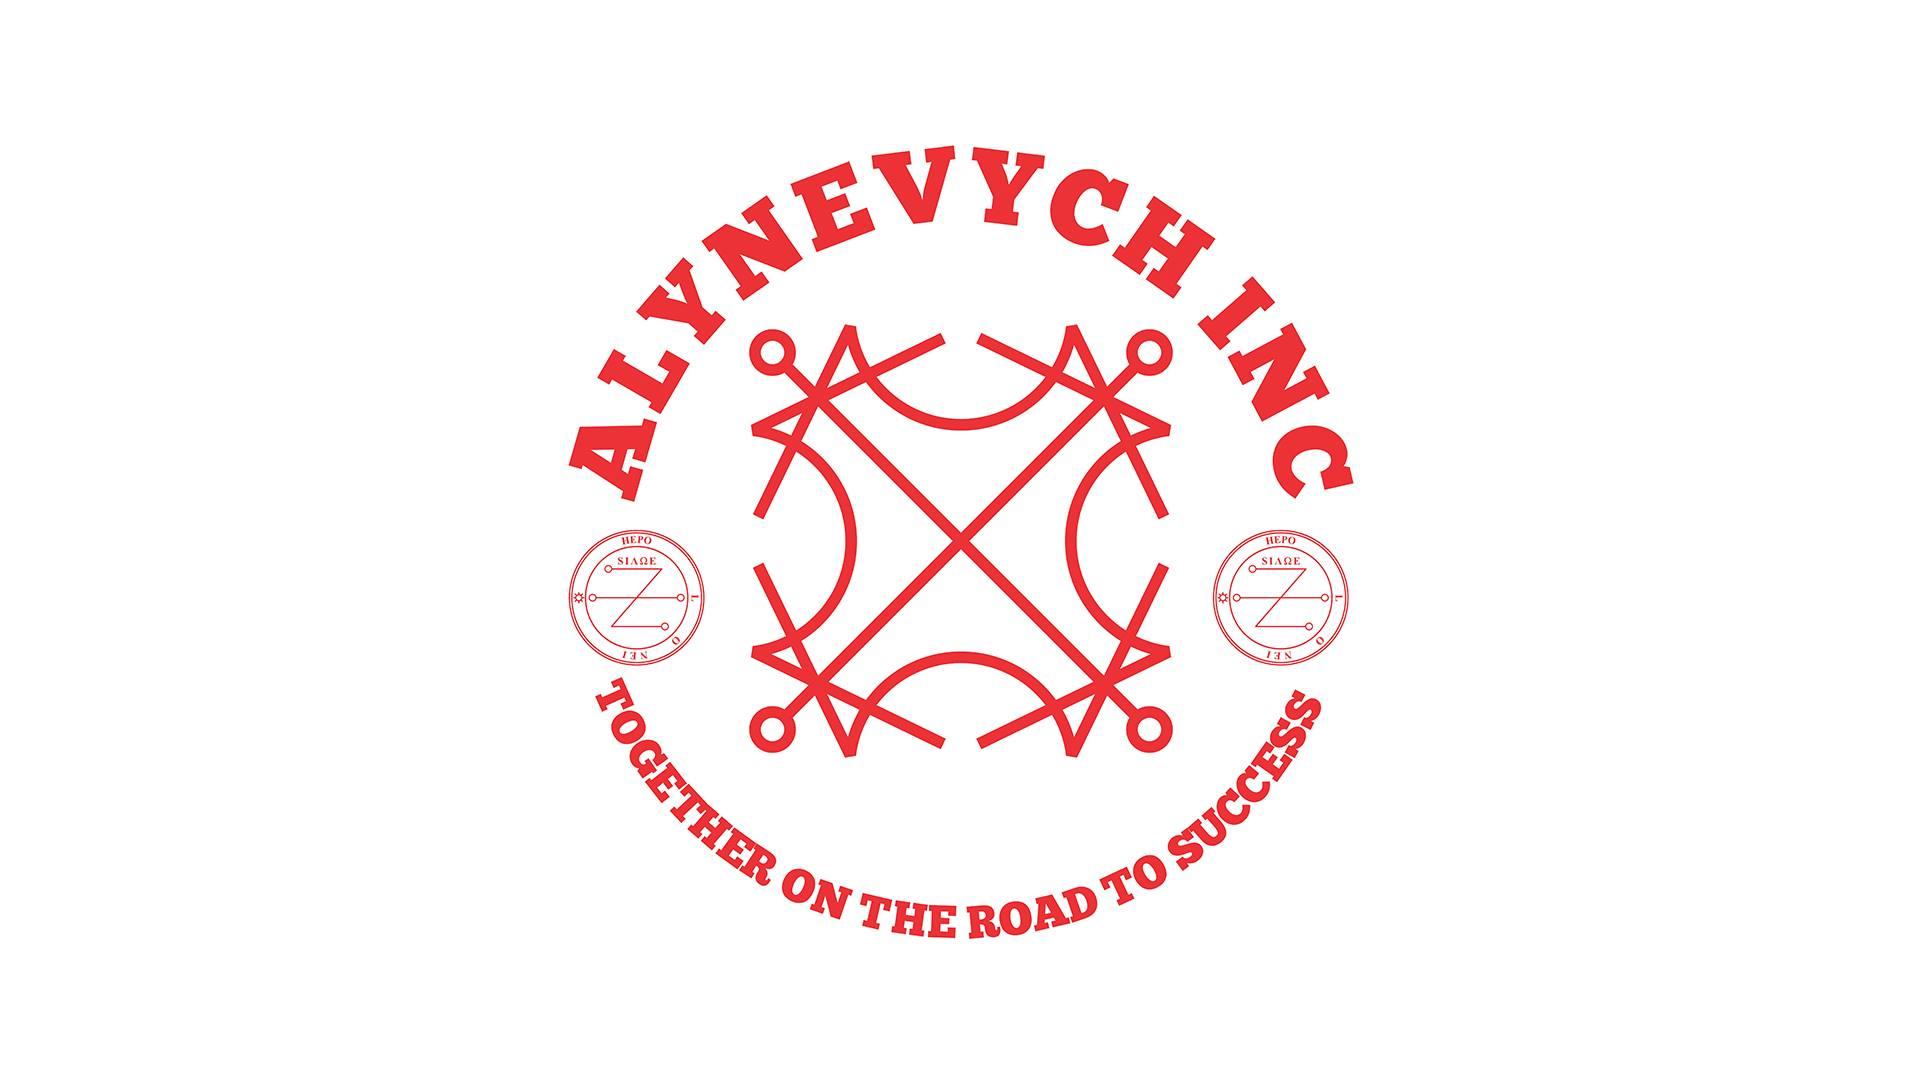 Professional Transportation Service - Alynevych INC.